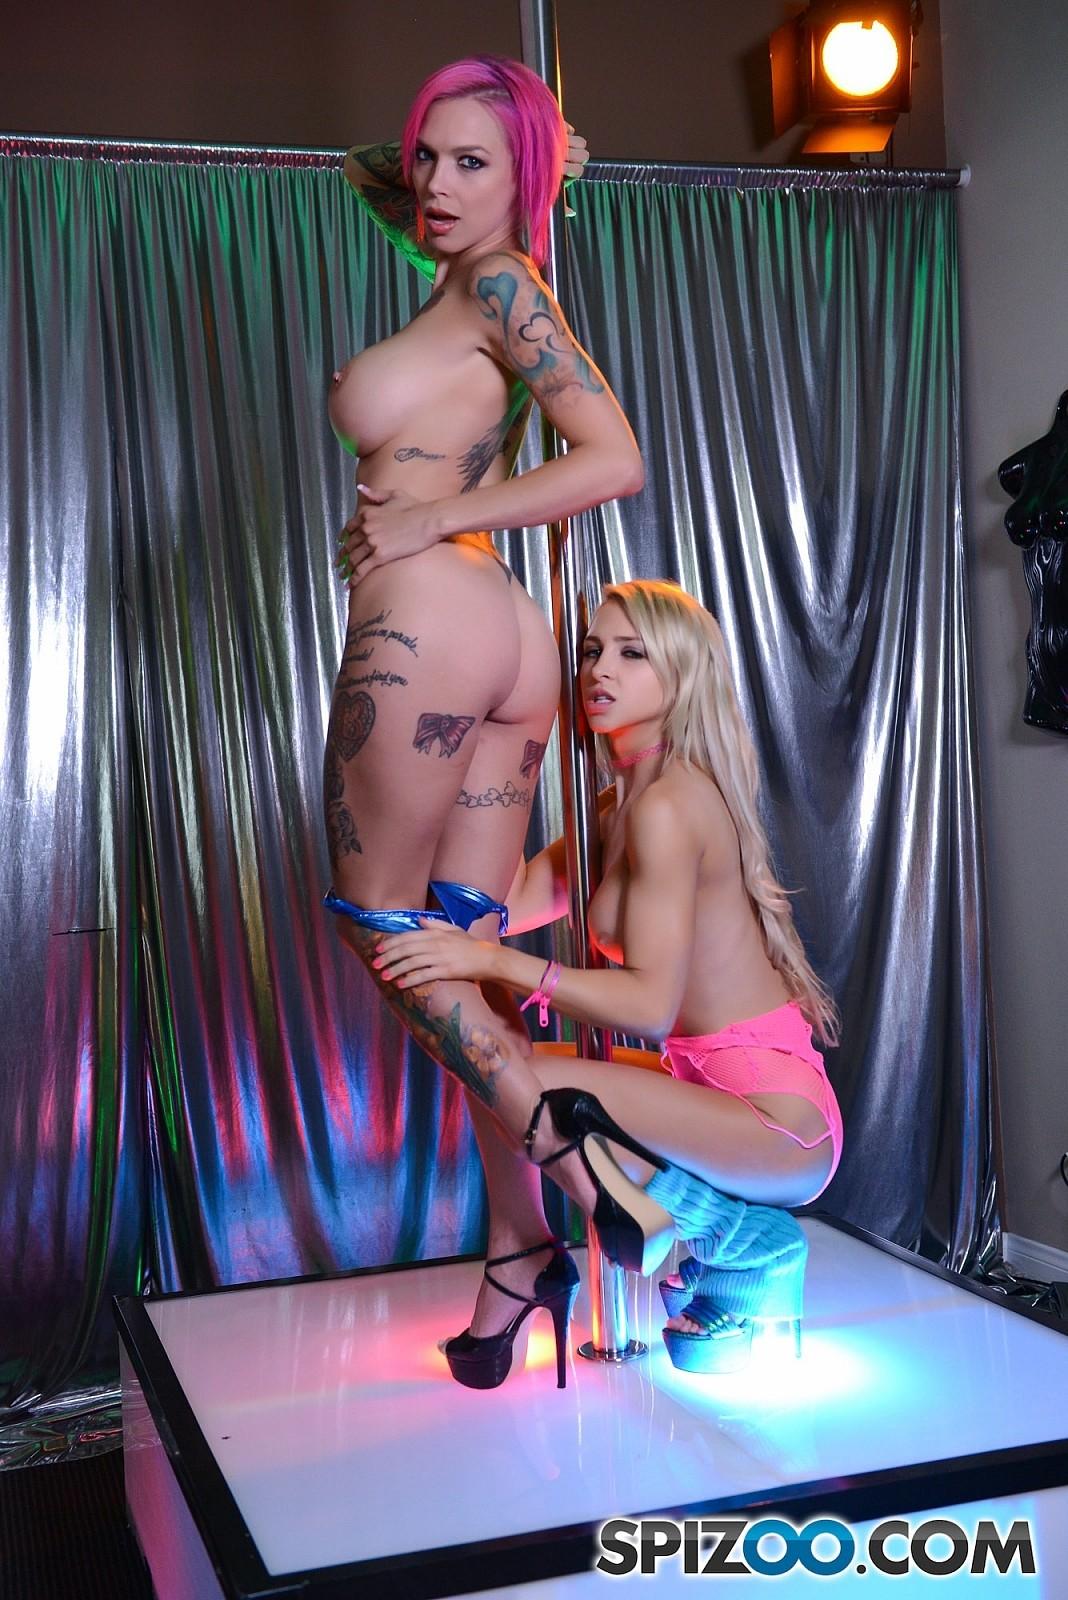 Fisting central tube porn